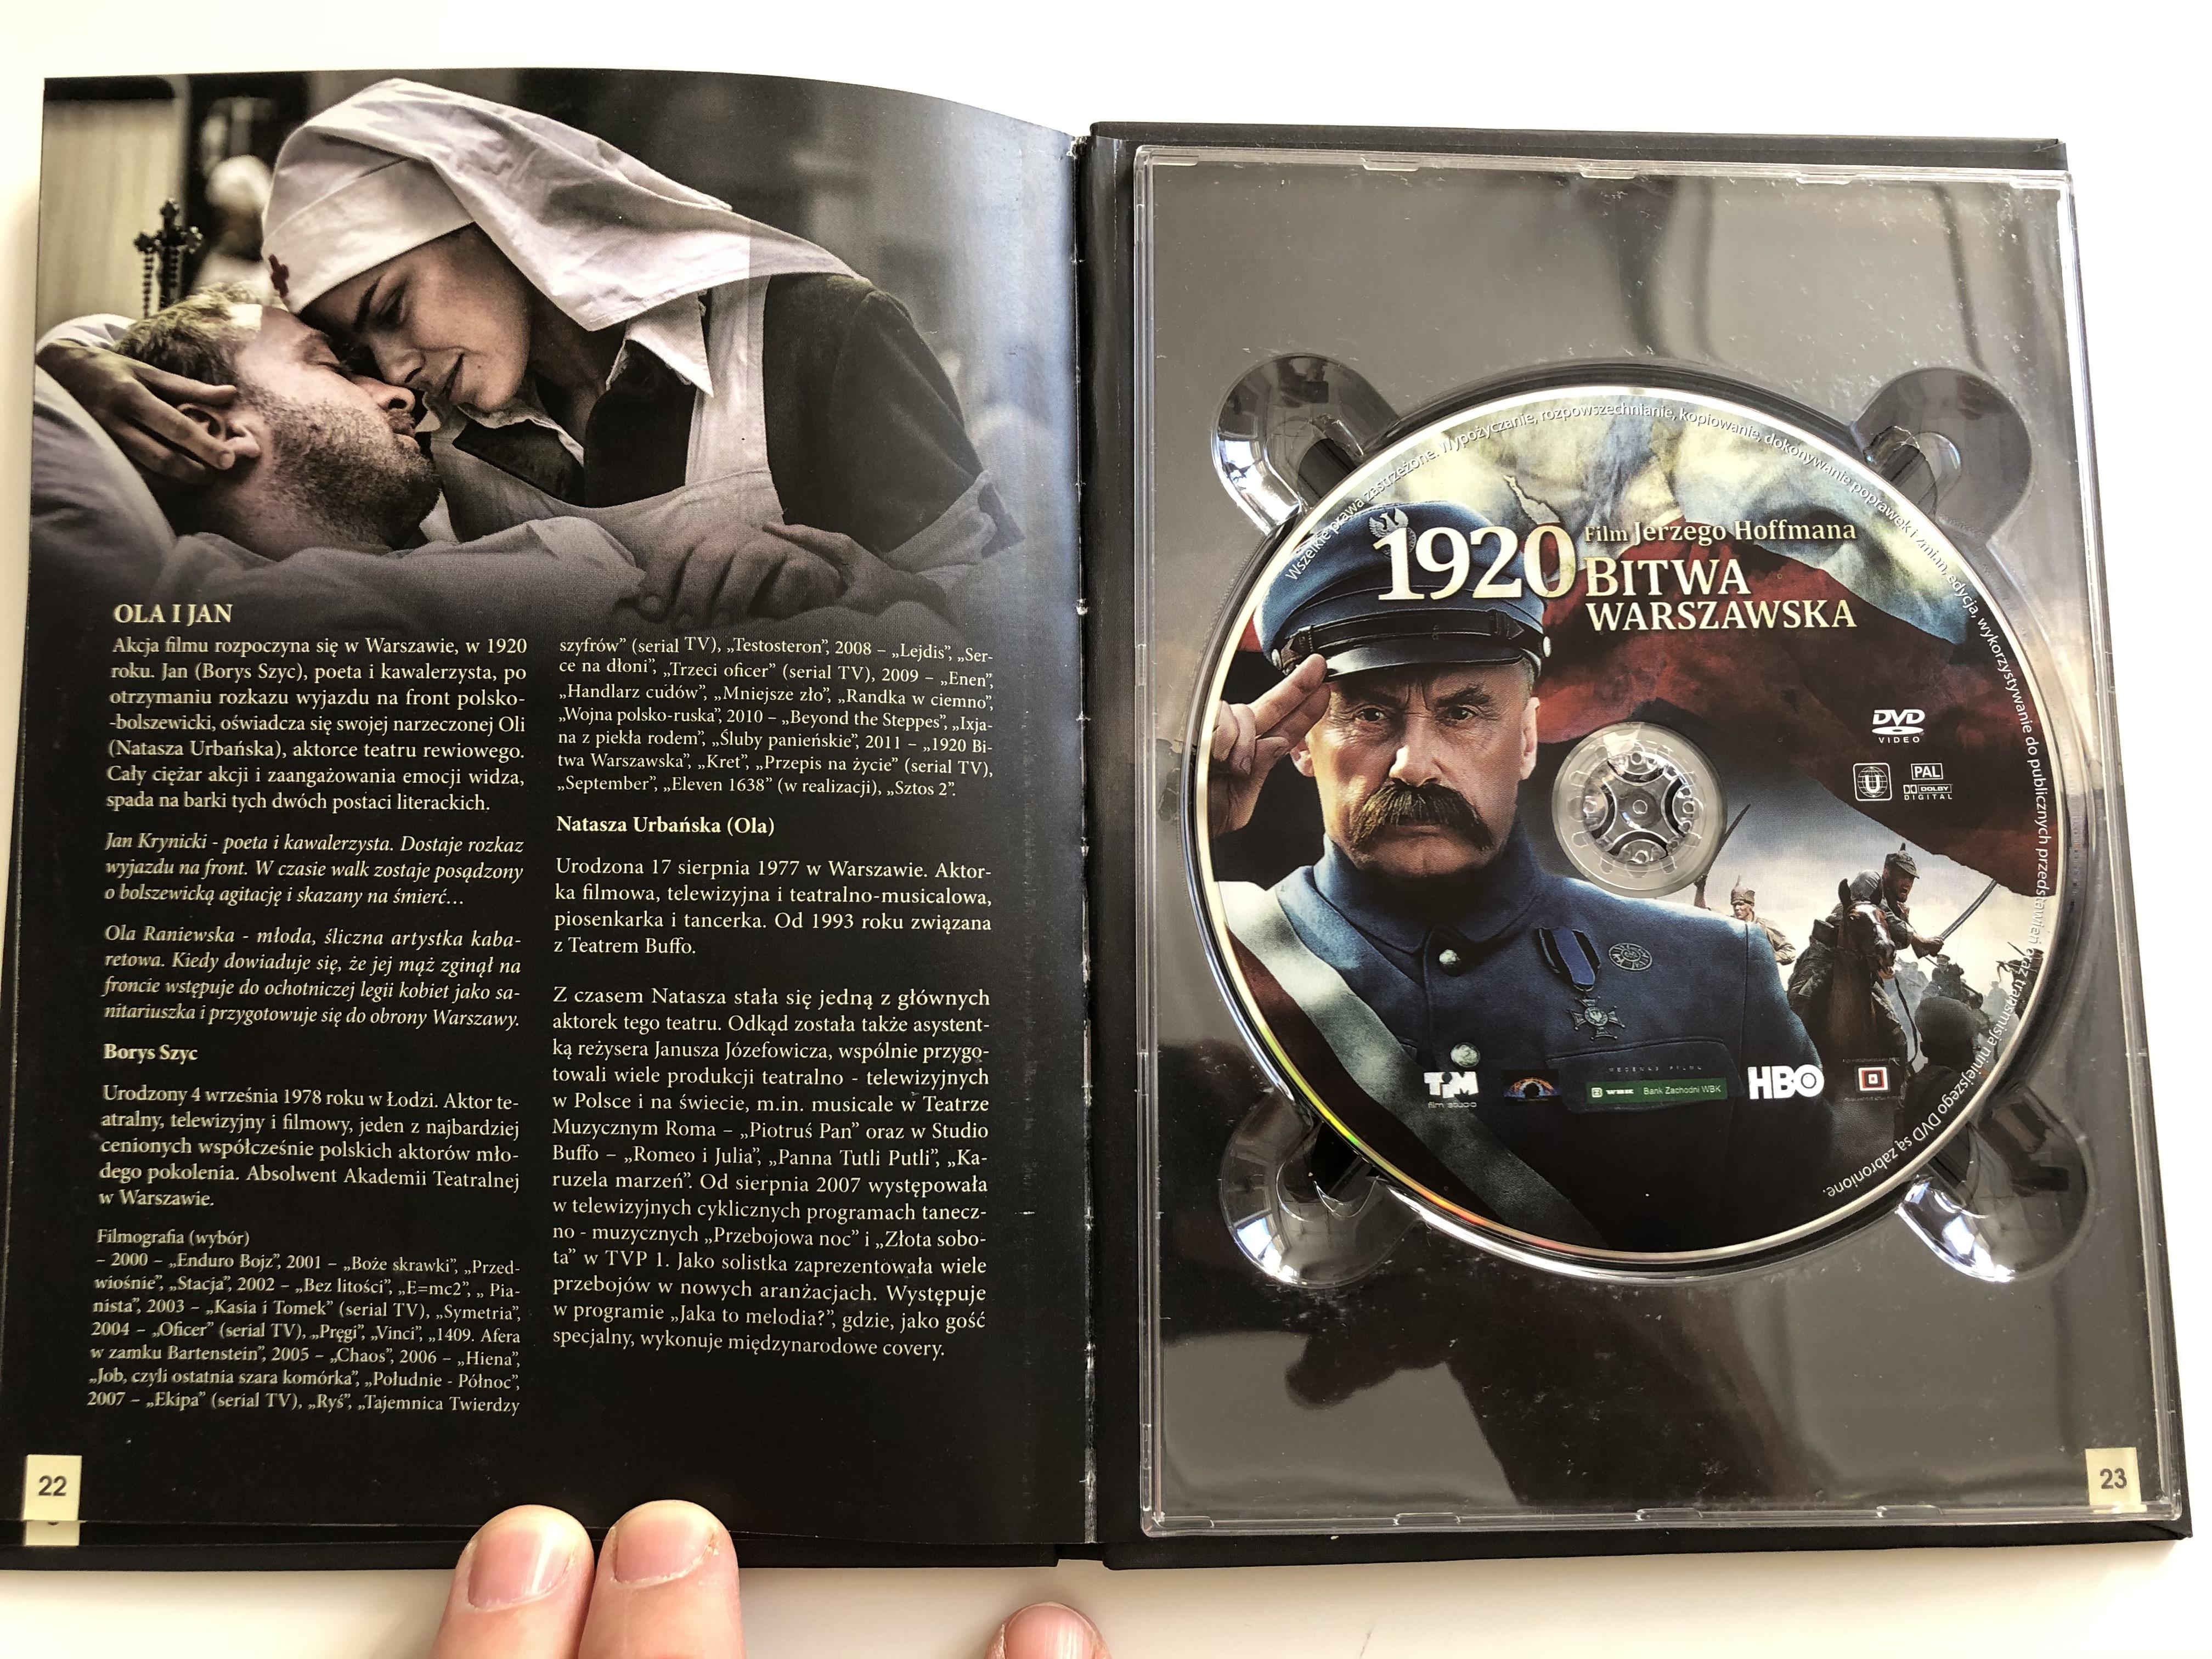 1920-bitwa-warszawska-dvd-2011-warsaw-battle-directed-by-jerzy-hoffman-12-.jpg